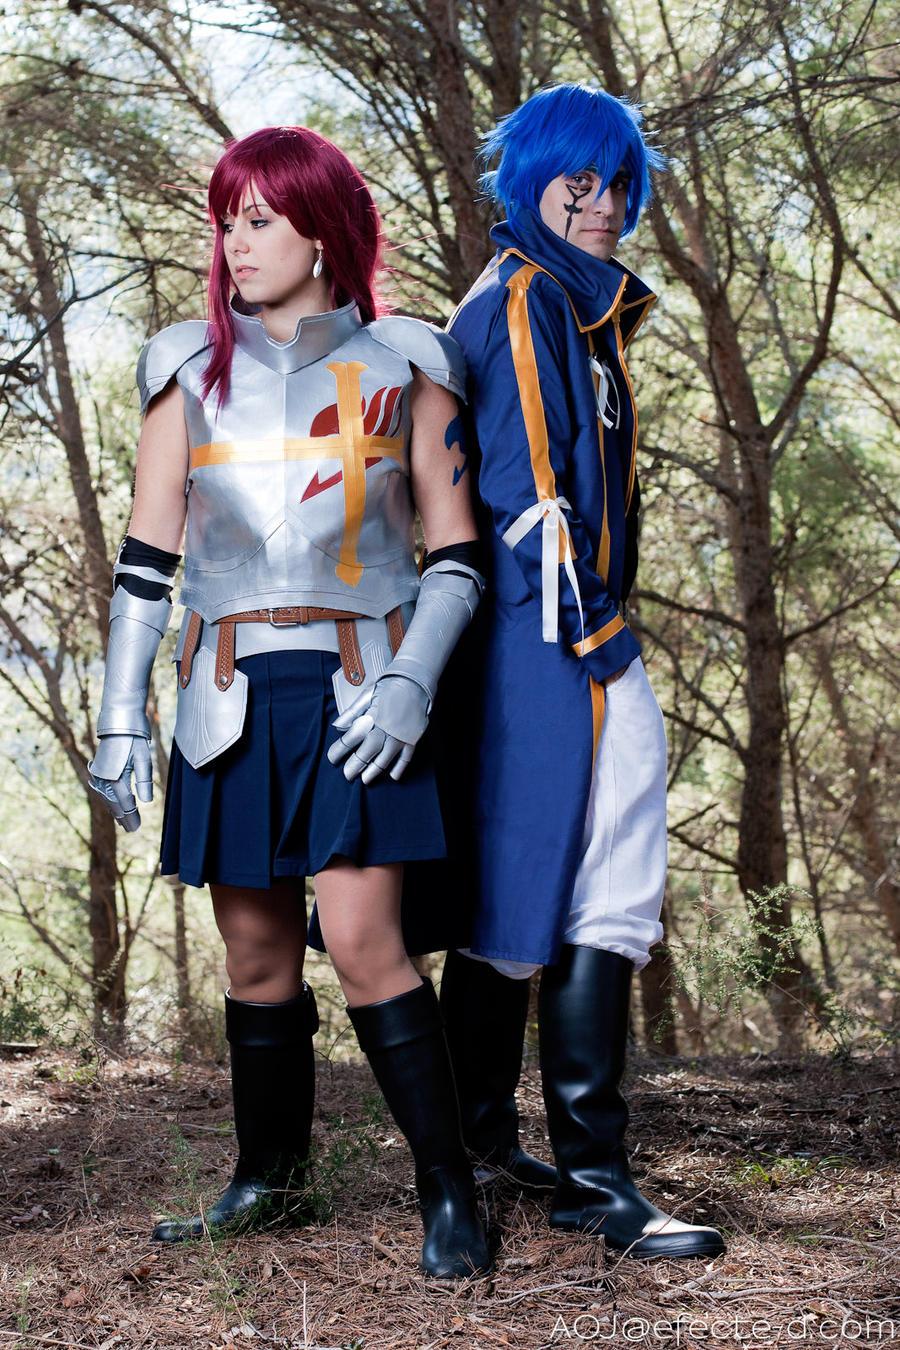 Erza Scarlett and Jellal Fernandez by Kuropun86 on DeviantArt